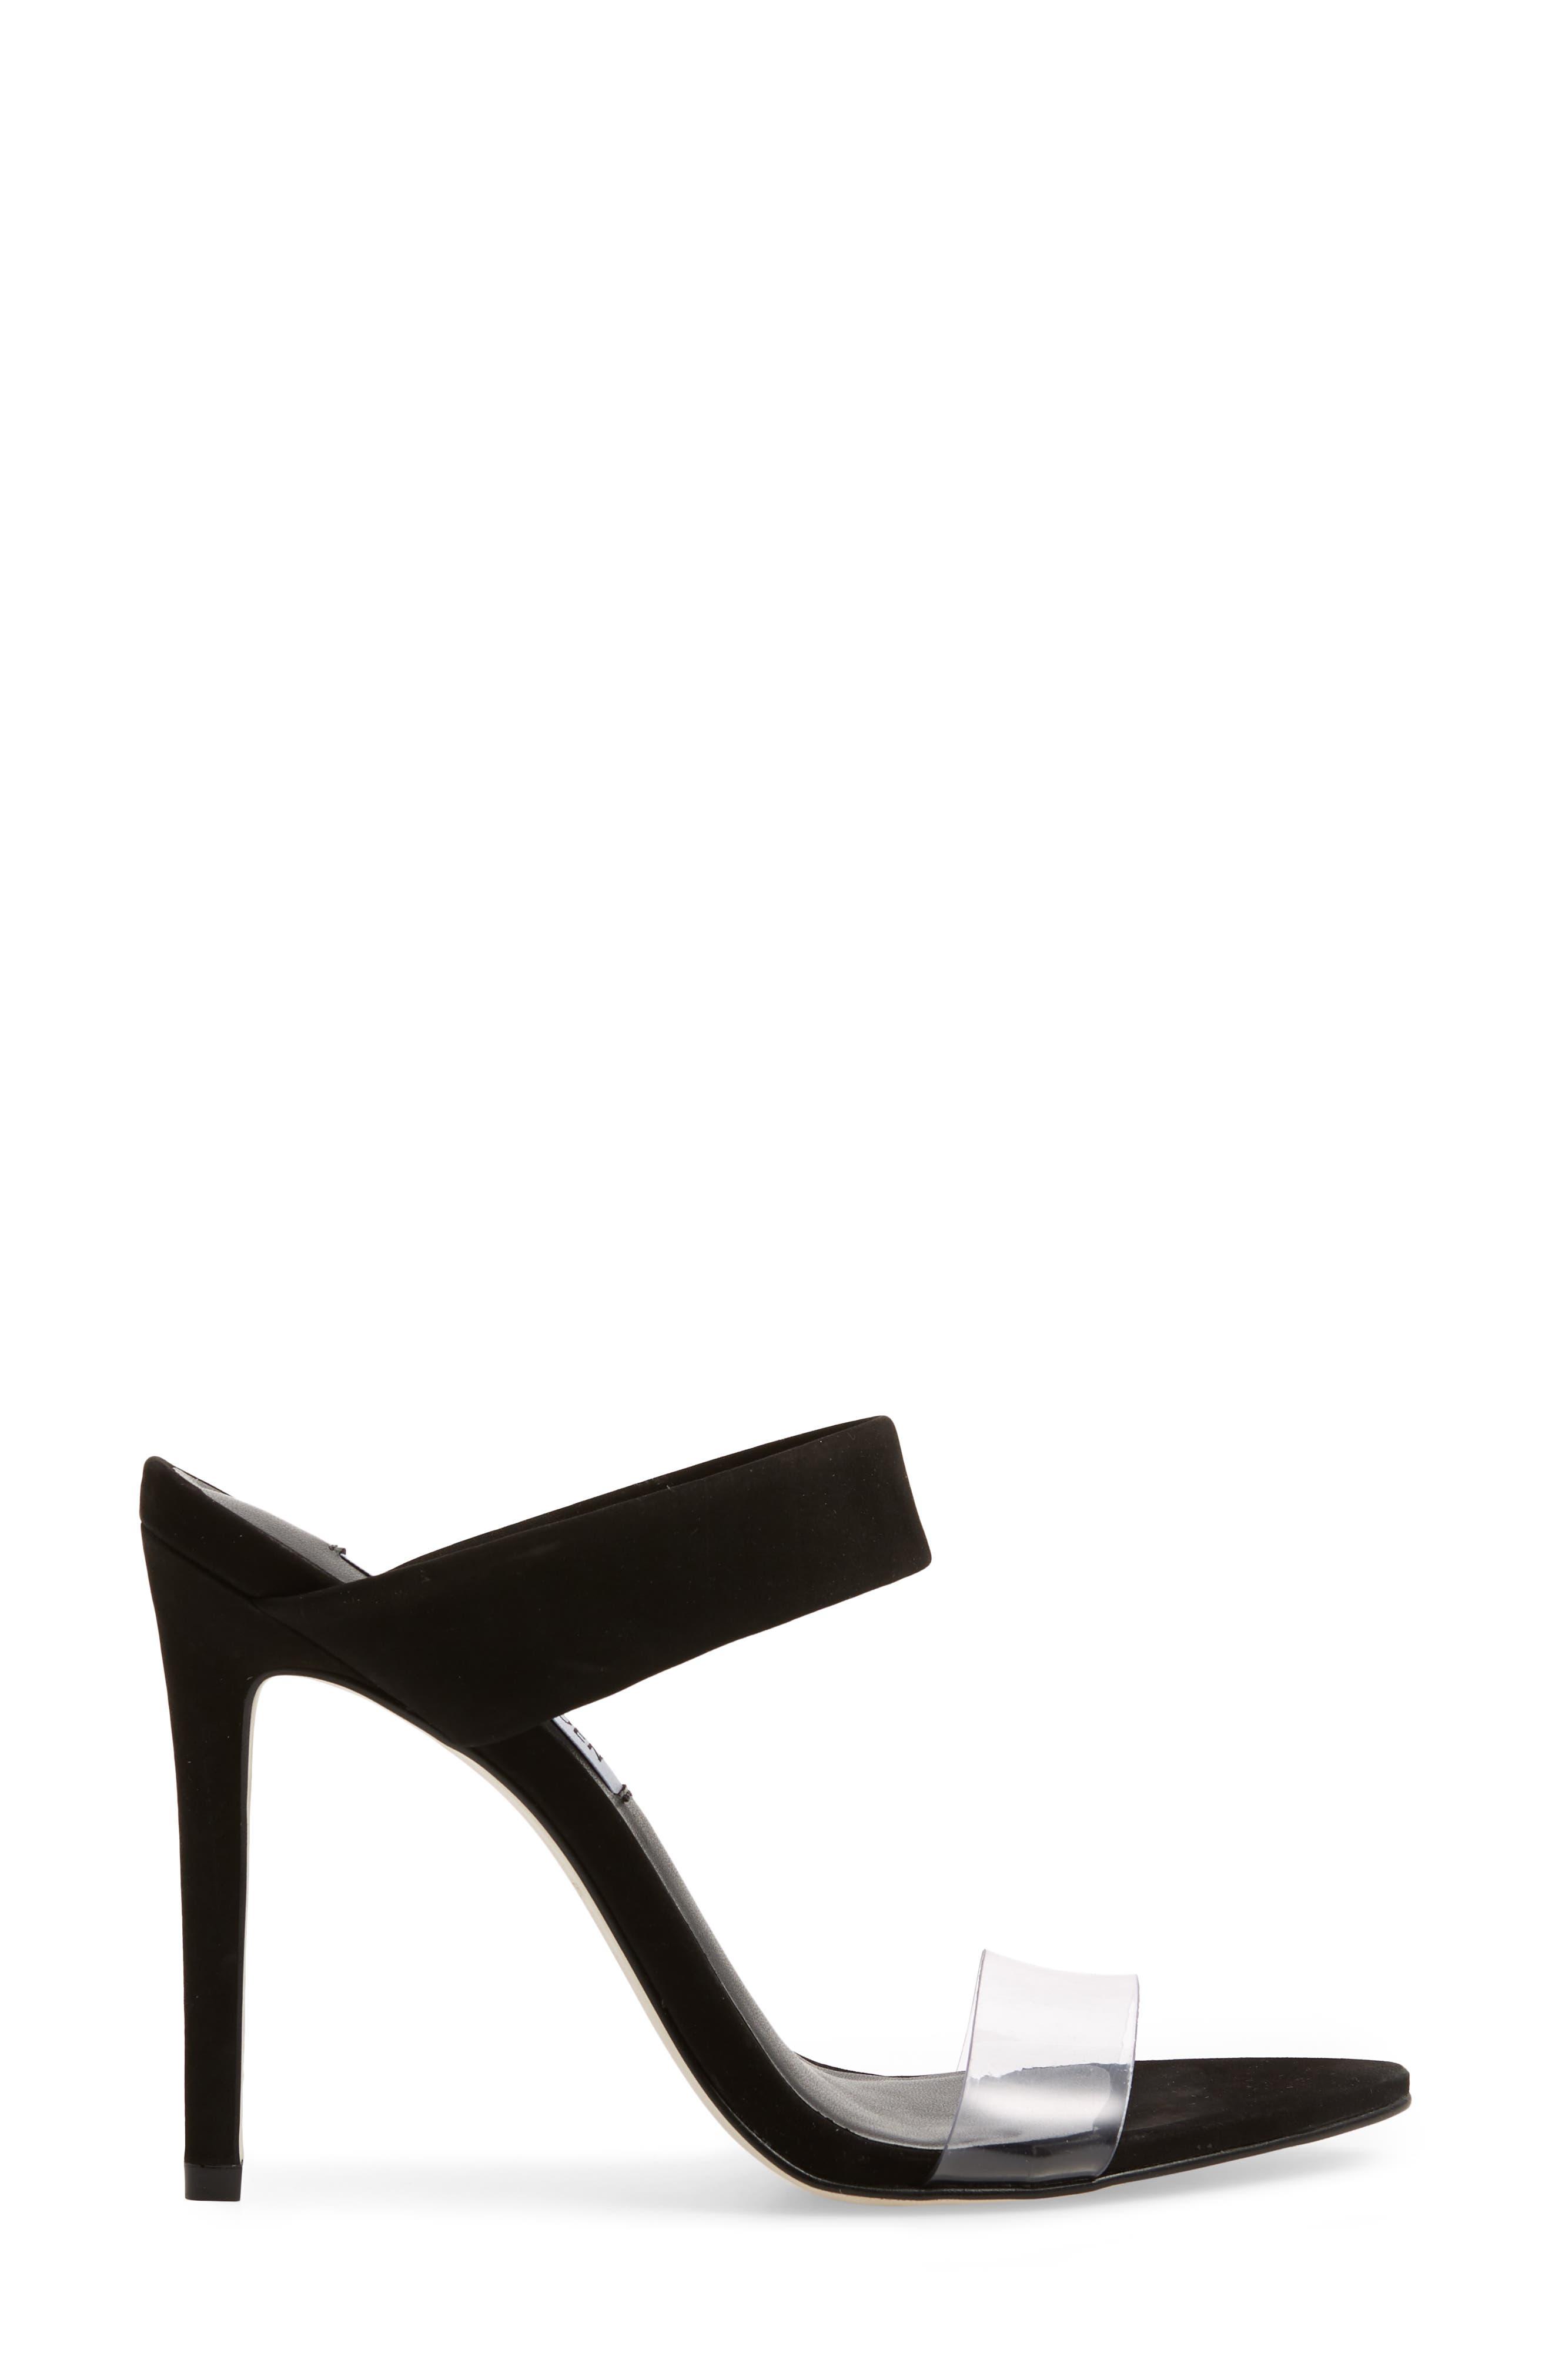 Amaya Clear Slide Sandal,                             Alternate thumbnail 3, color,                             BLACK NUBUCK LEATHER